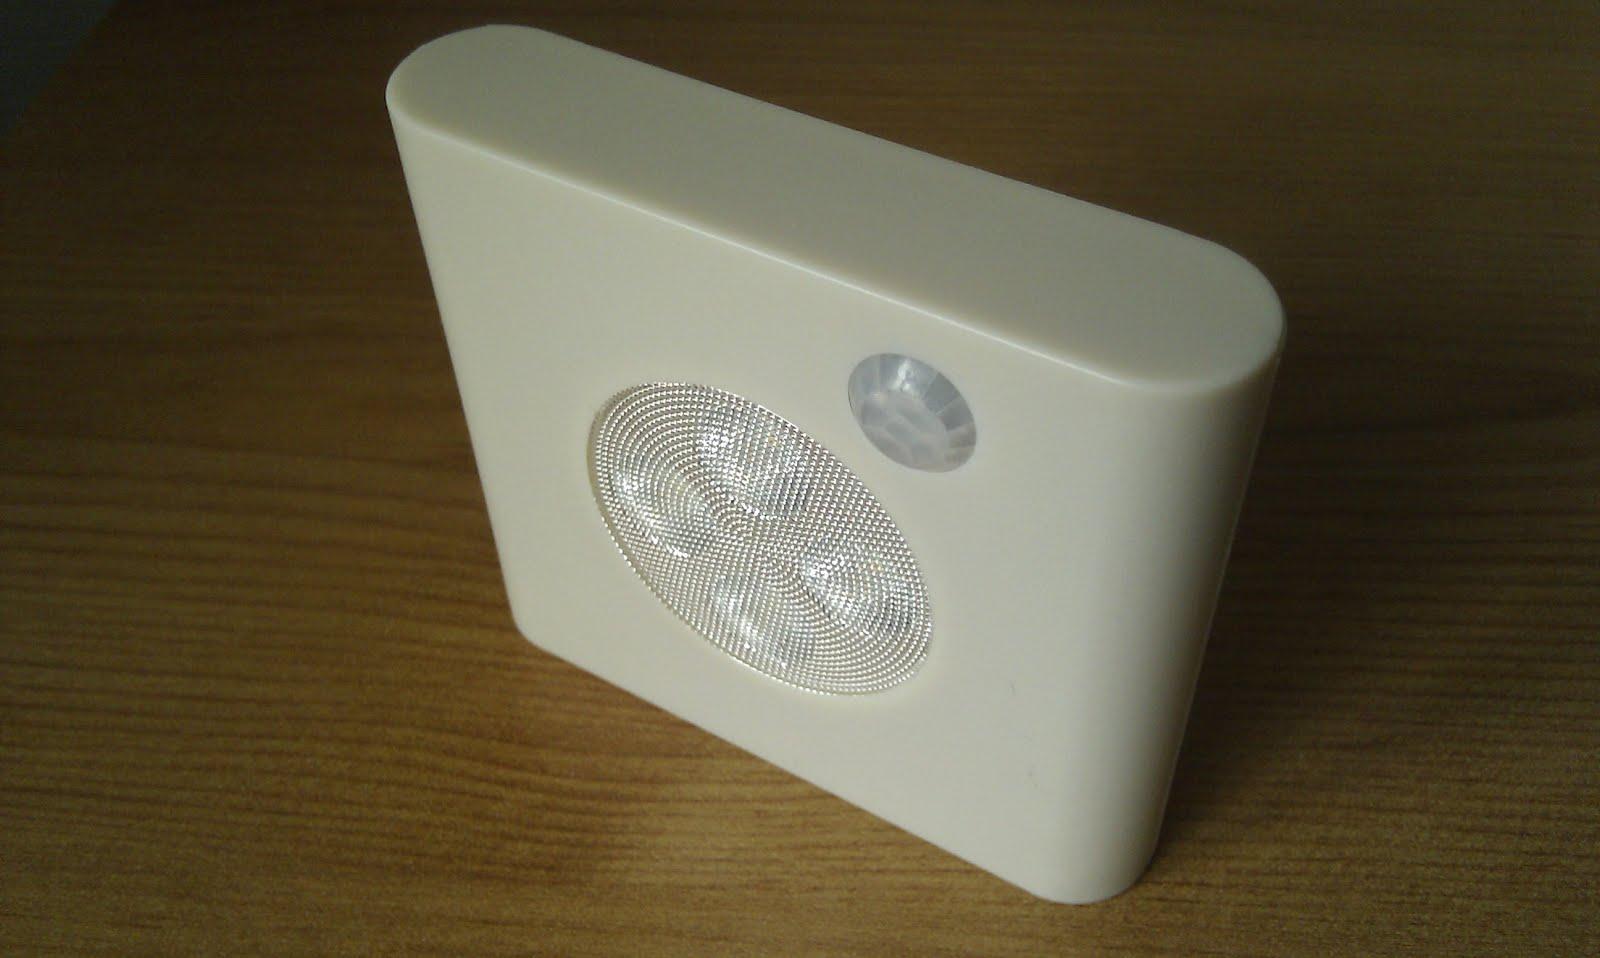 closet lighting battery. Ikea Closet Lighting. Lighting 7 Battery X